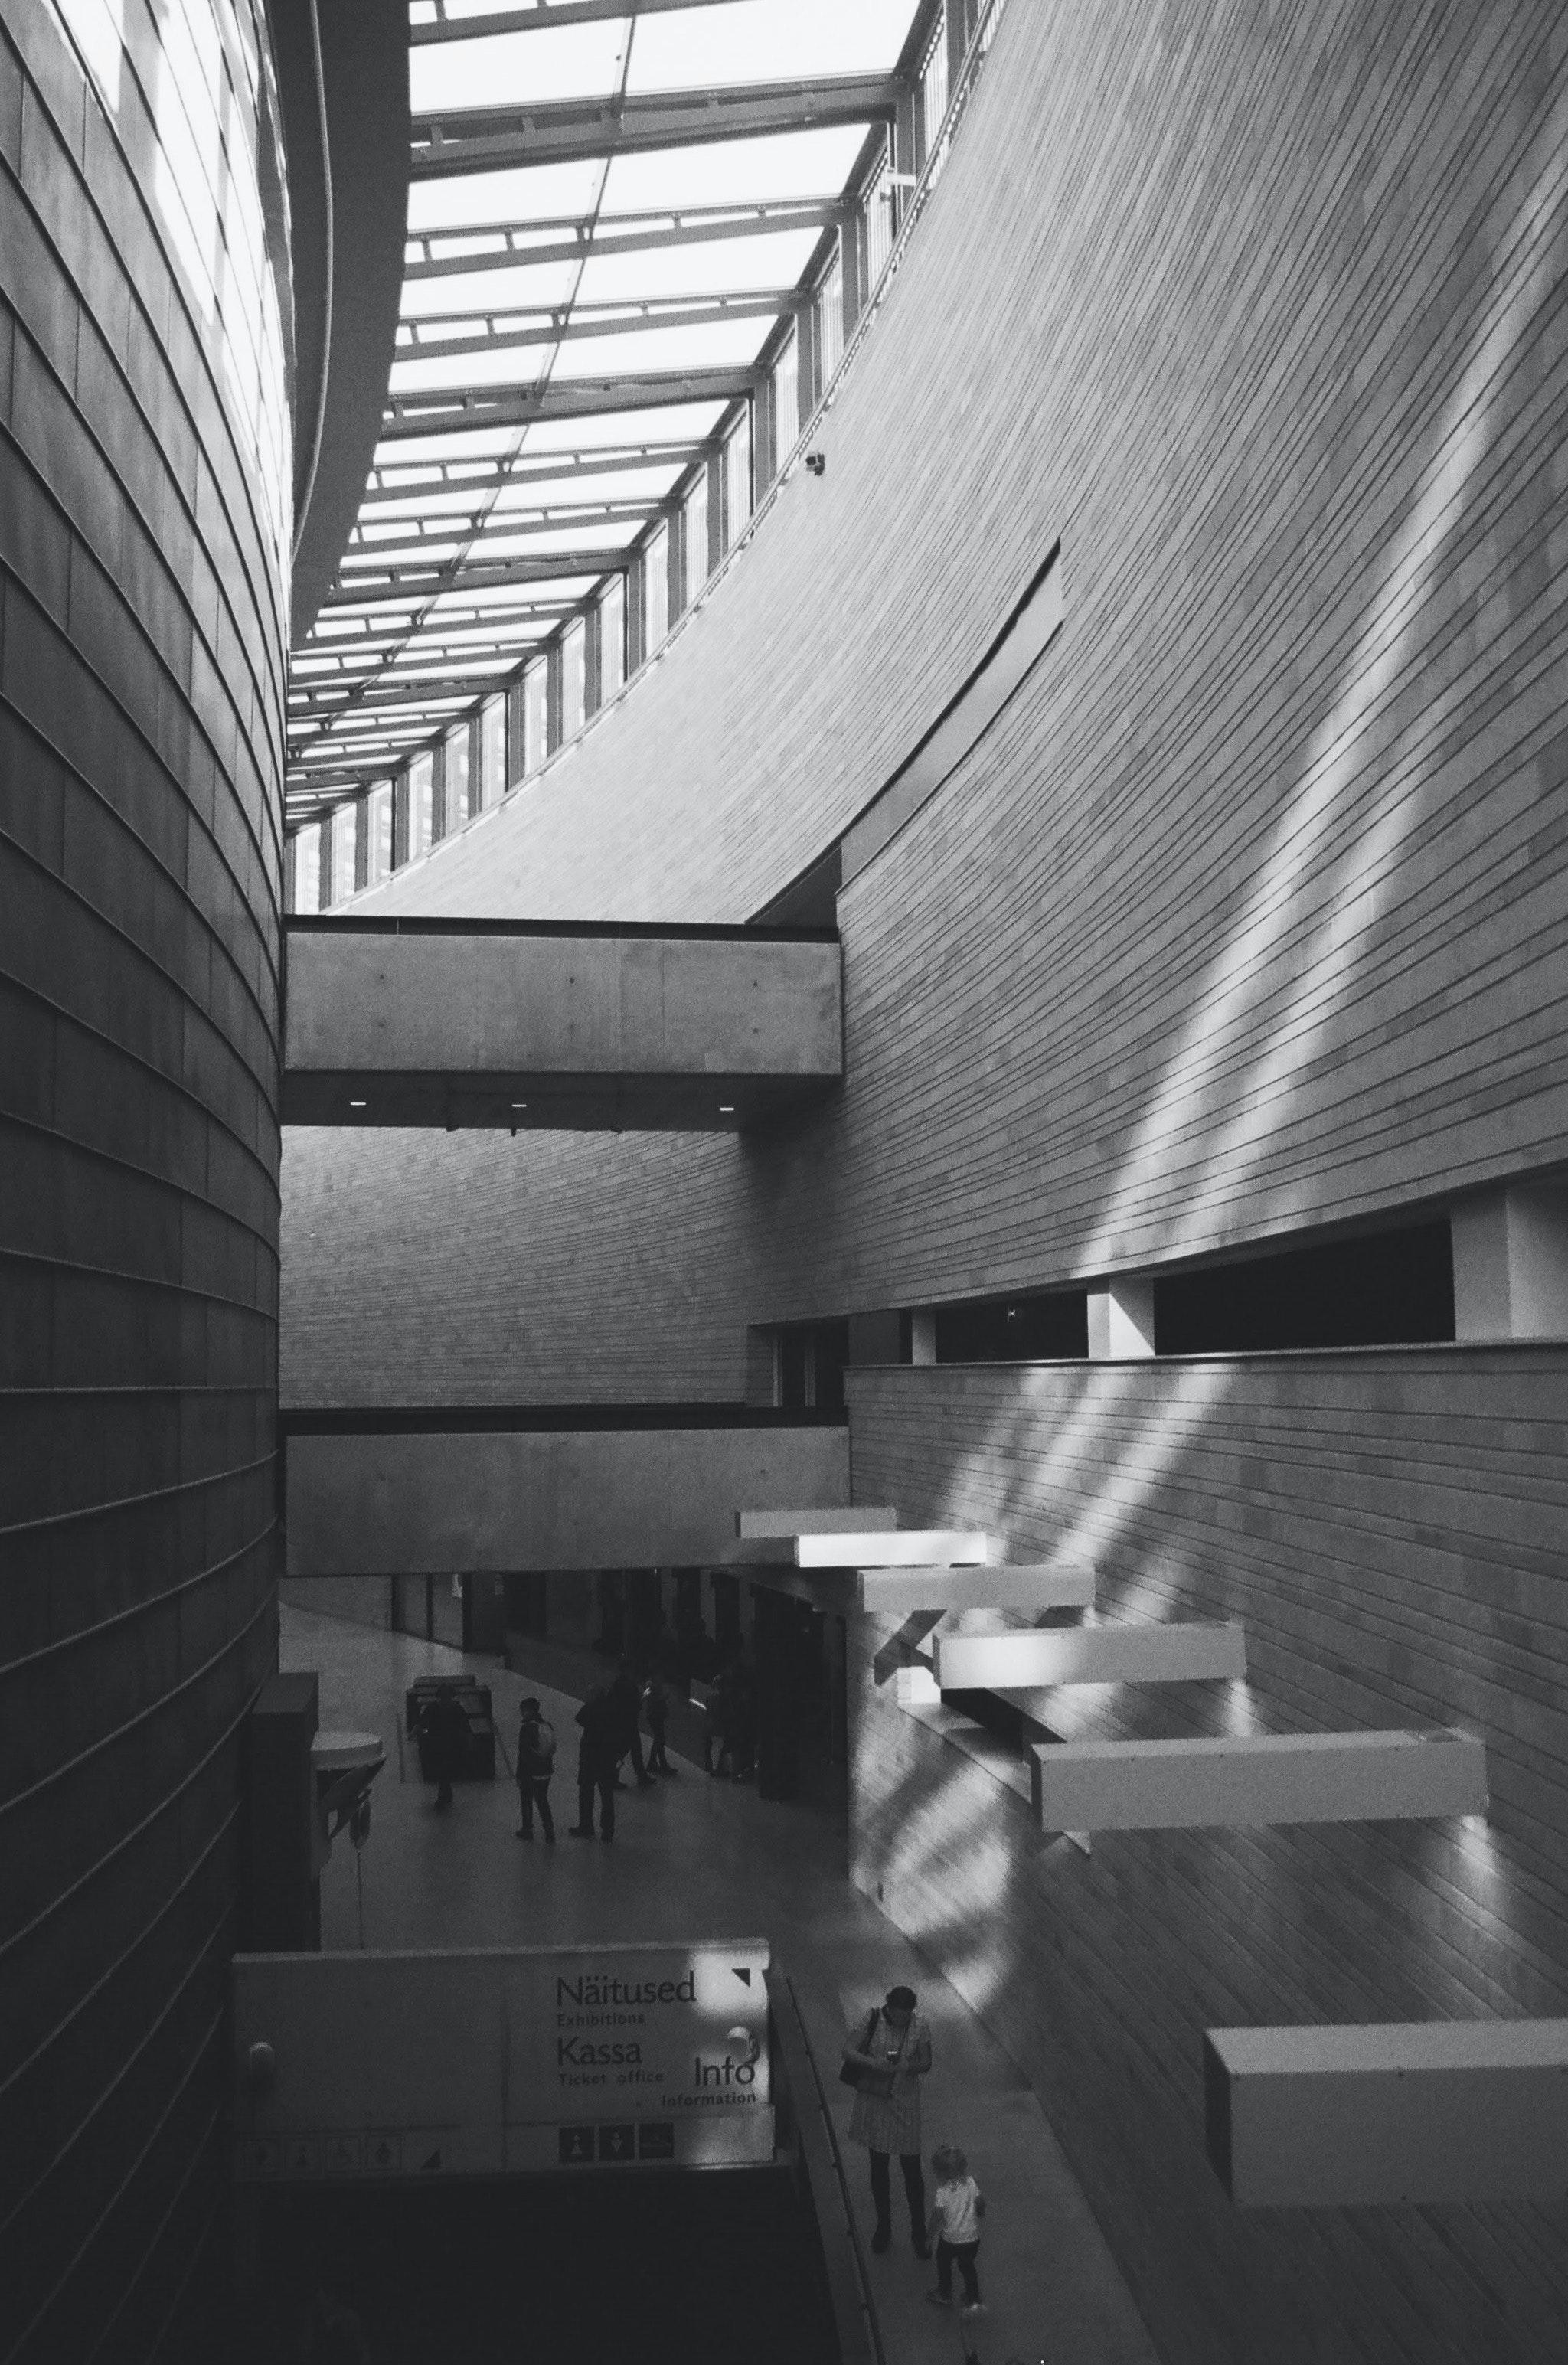 Greyscale Photo Of Building Interior Free Stock Photo